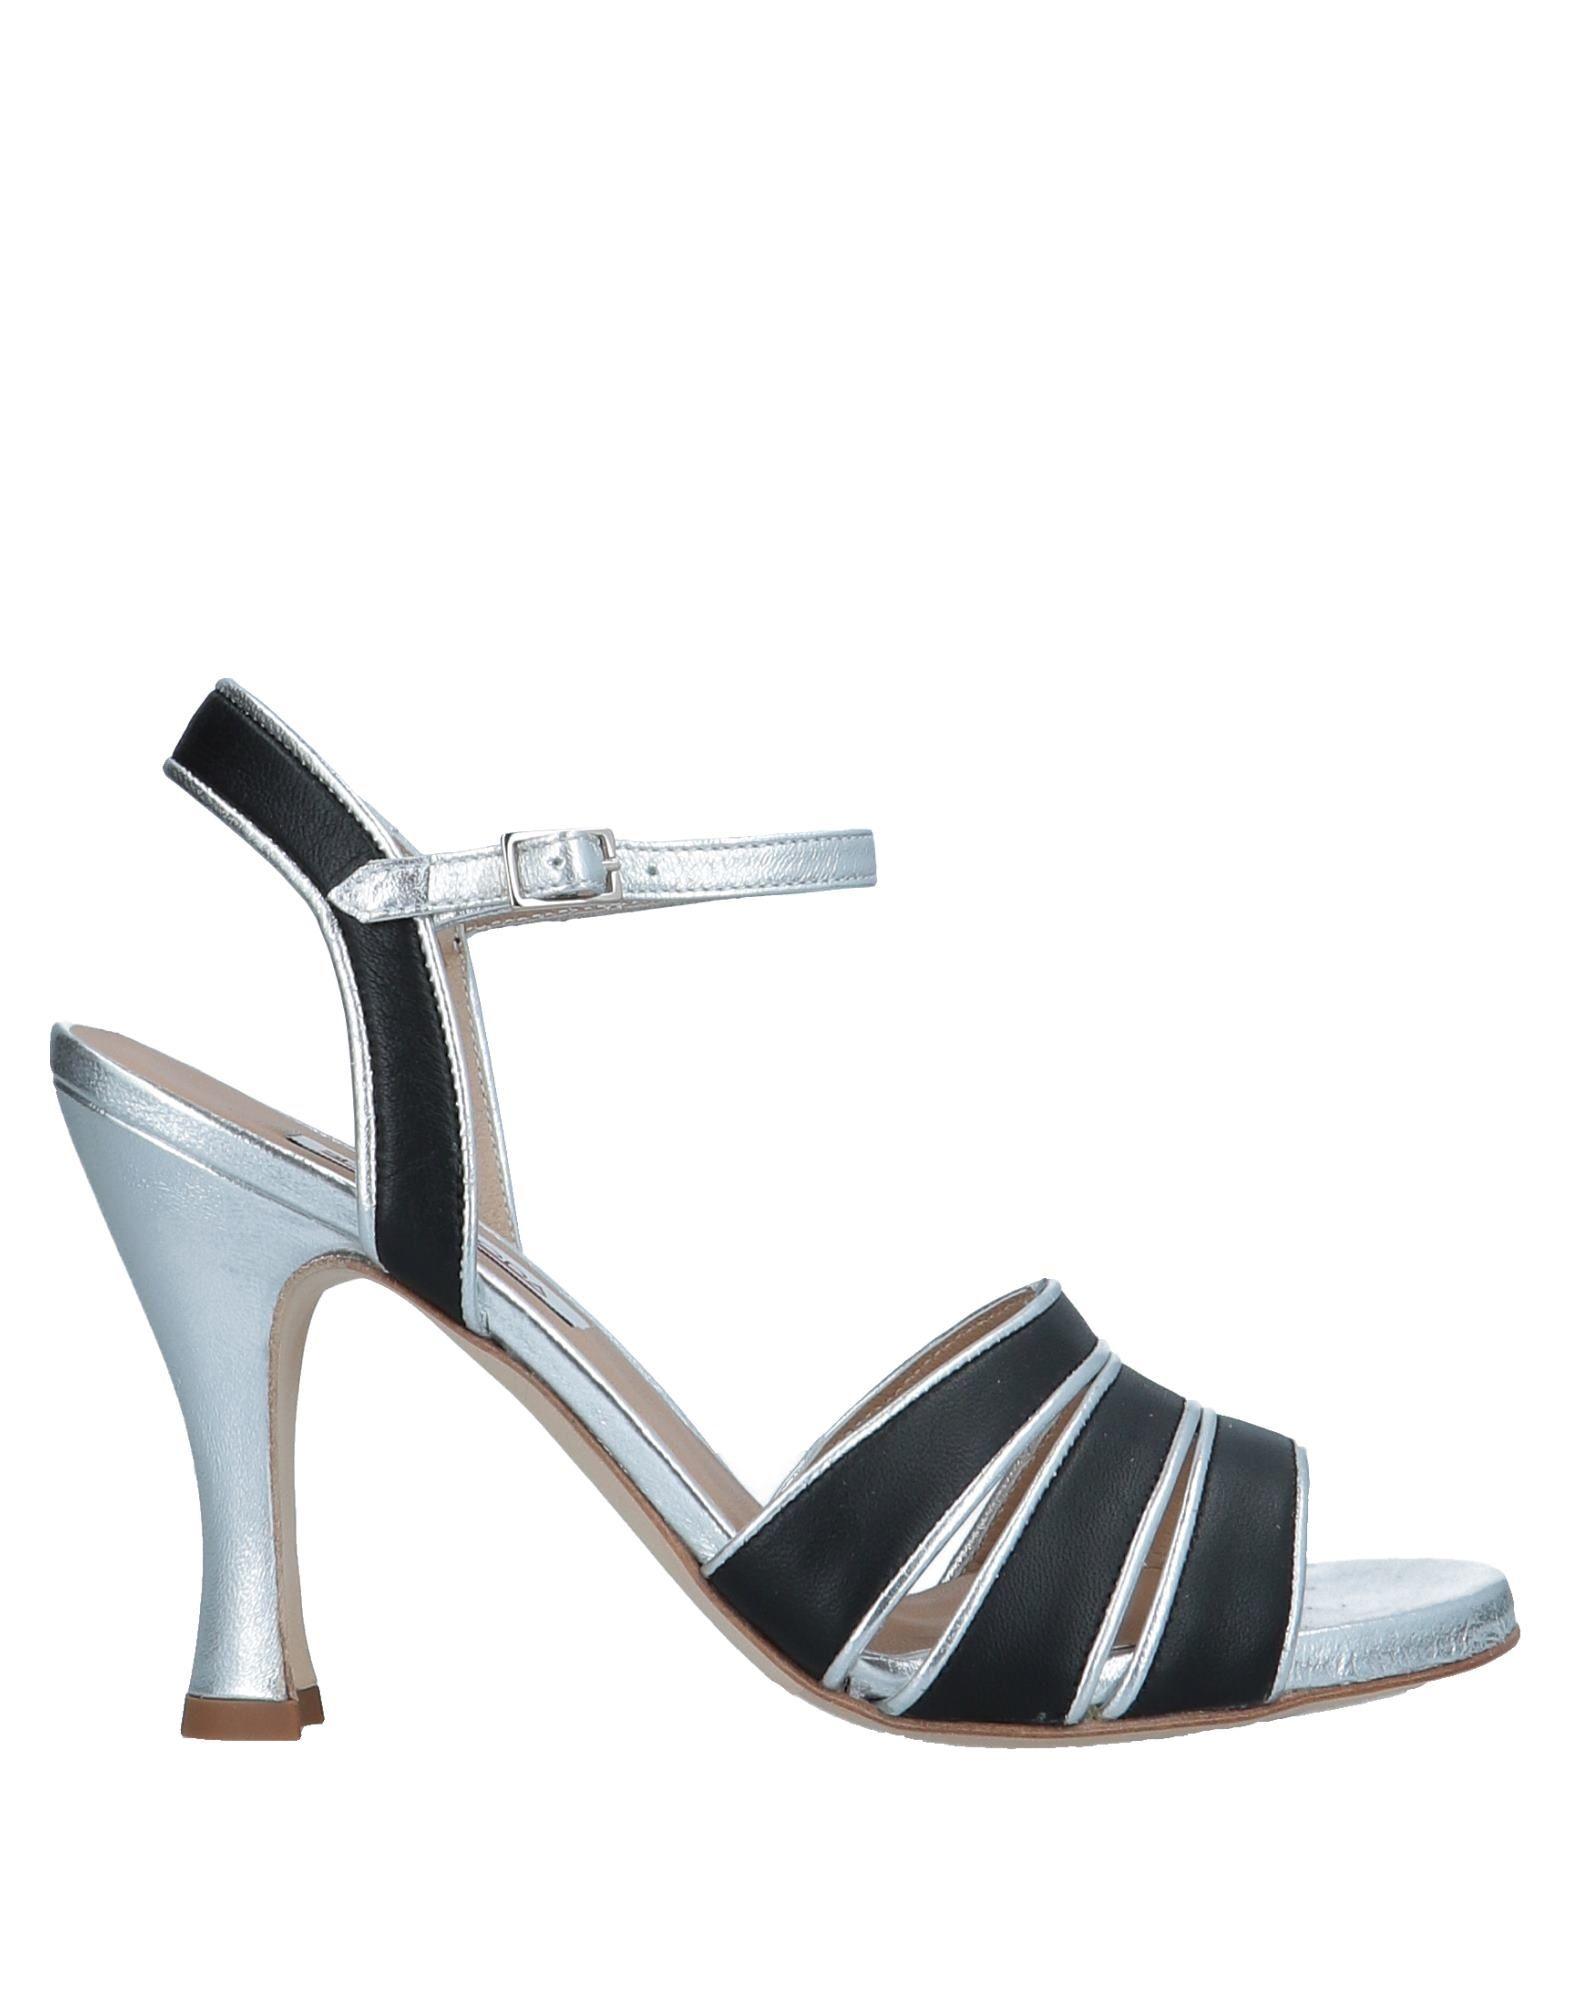 spaziomoda sandales - femmes spaziomoda sandales en ligne sur sur sur canada - 11572859xa ea9d52